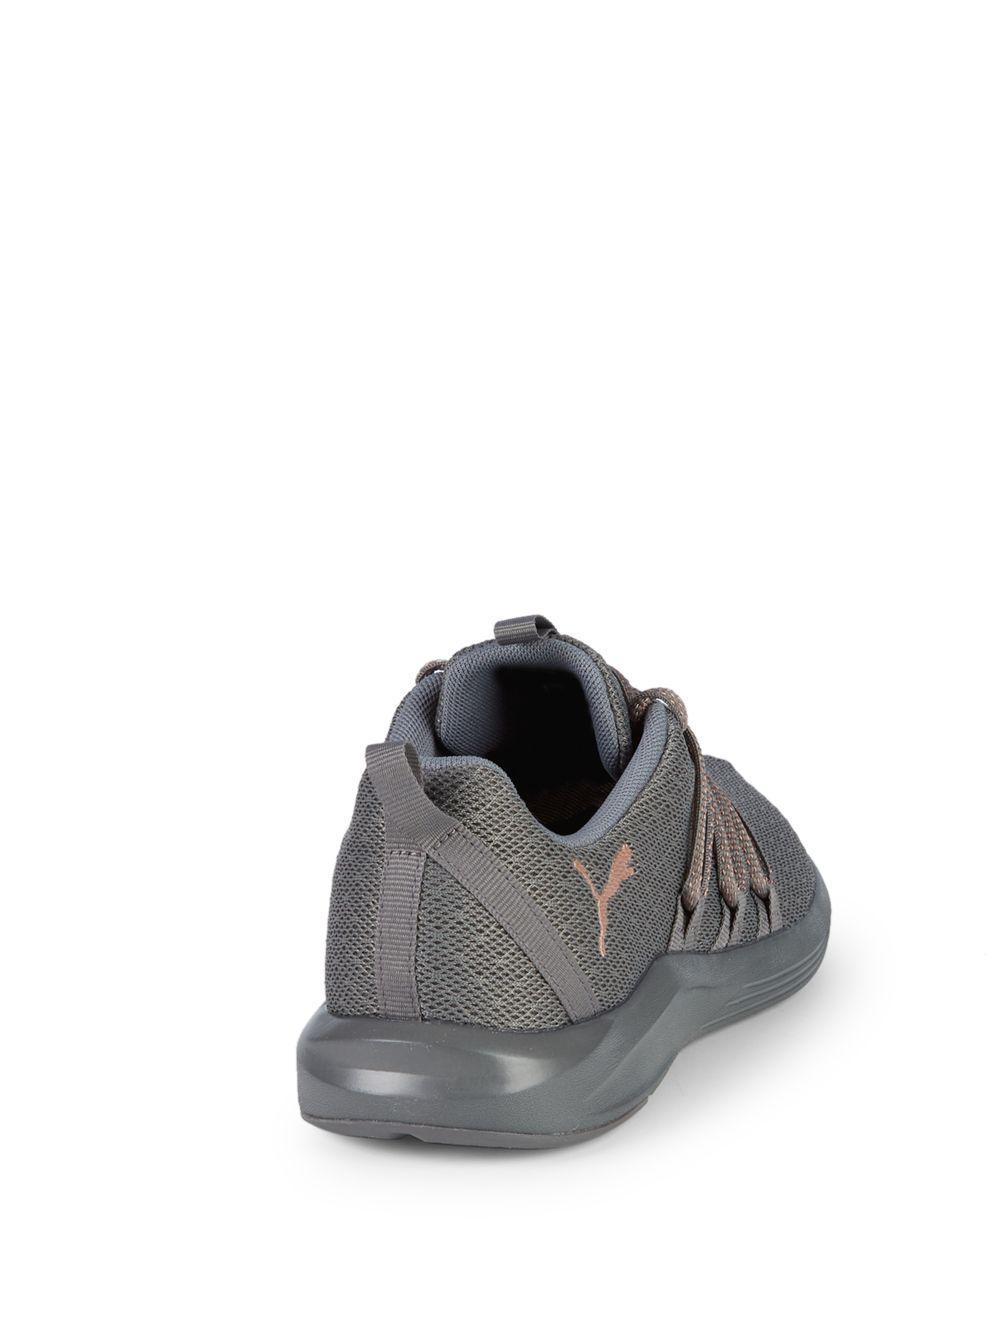 a2f0c249384c Puma Prowl Alt Knit Mesh Sneakers in Gray - Lyst